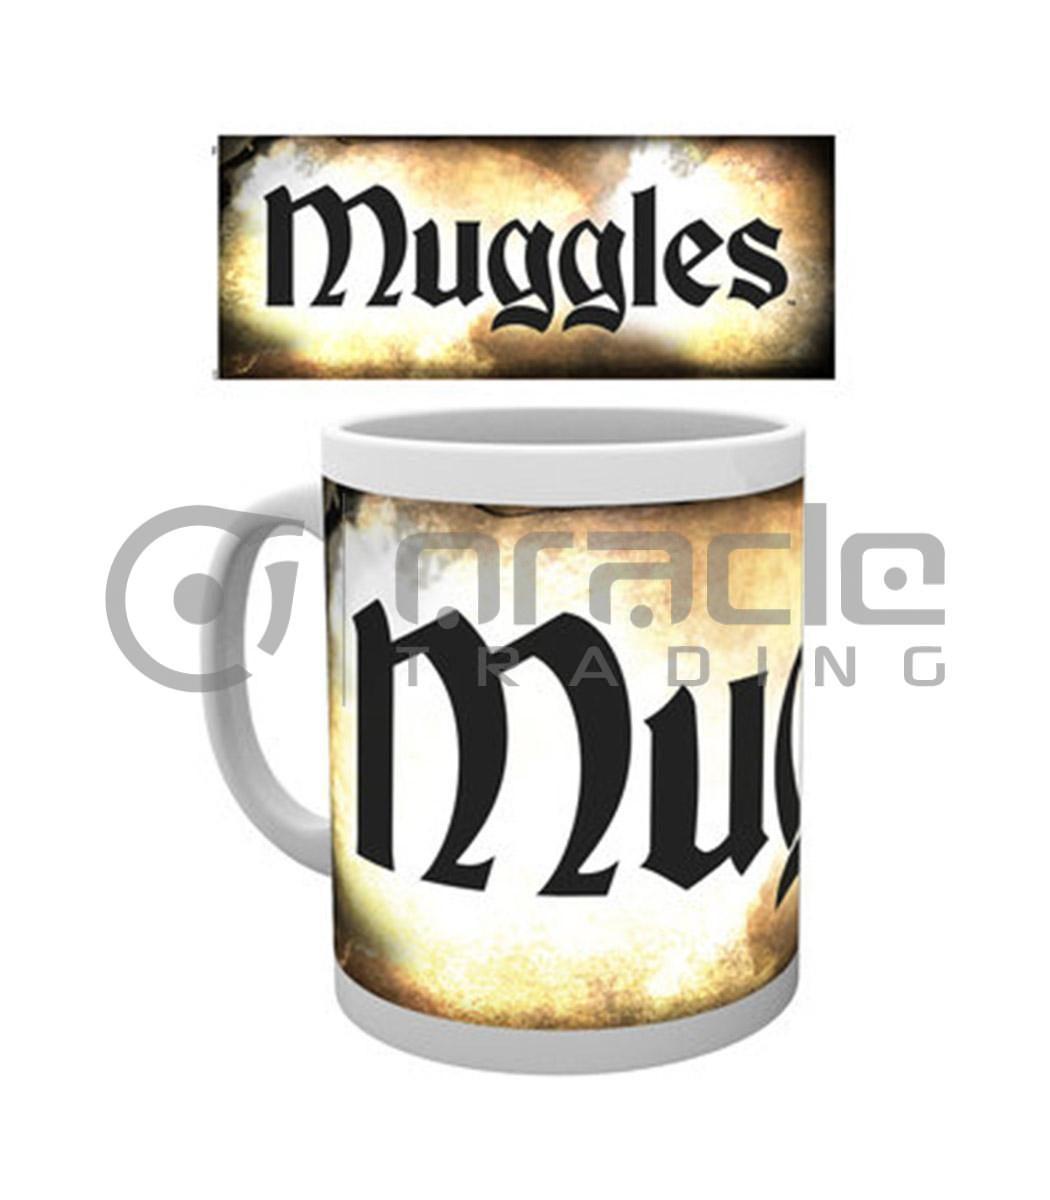 Harry Potter Muggles Coffee Mug